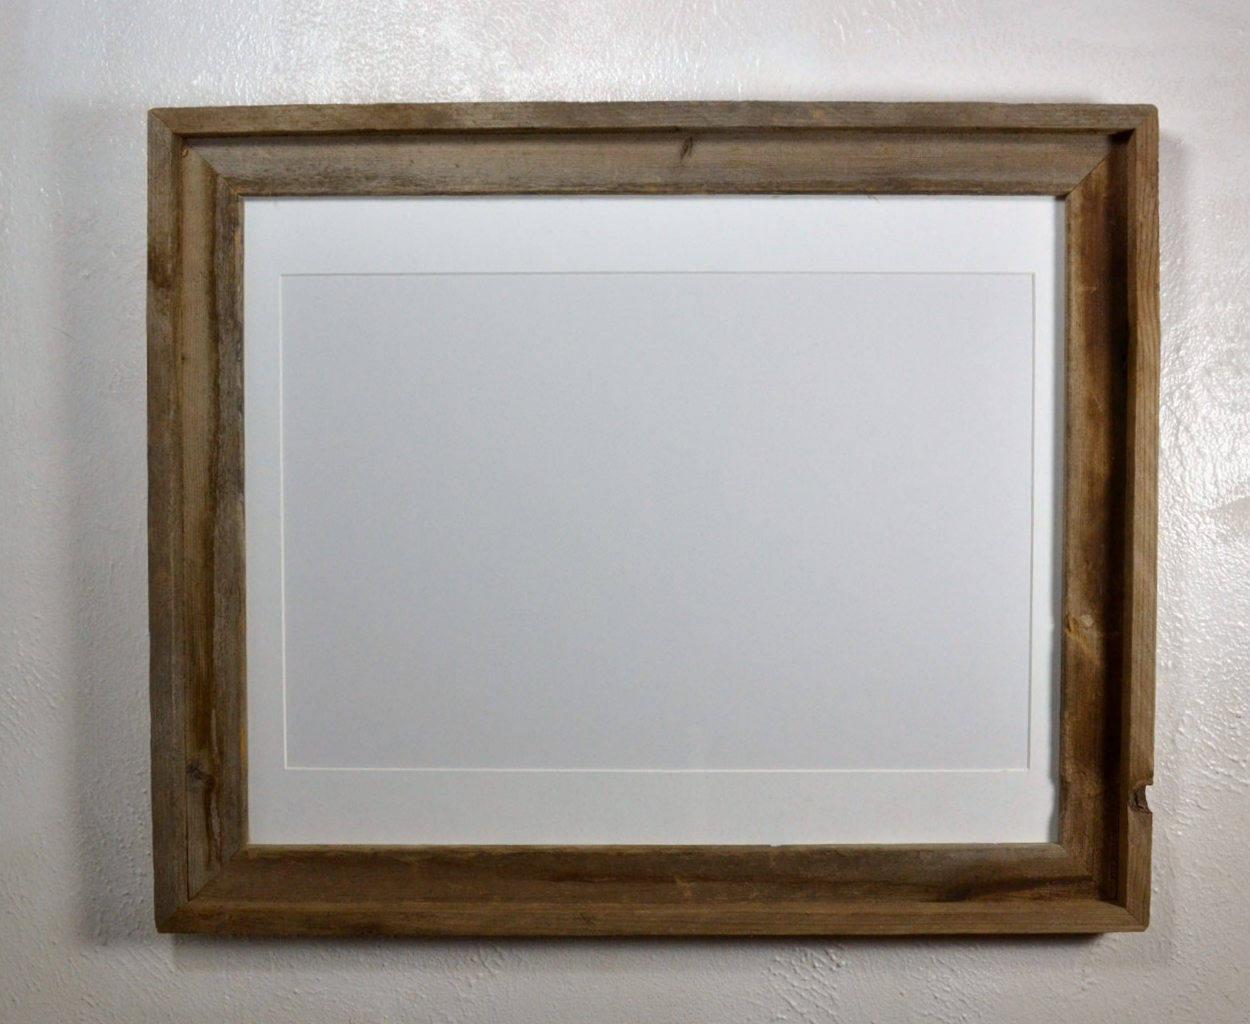 Rustic wood frame 12x18 white mat fits 11x1412x1611x17 or